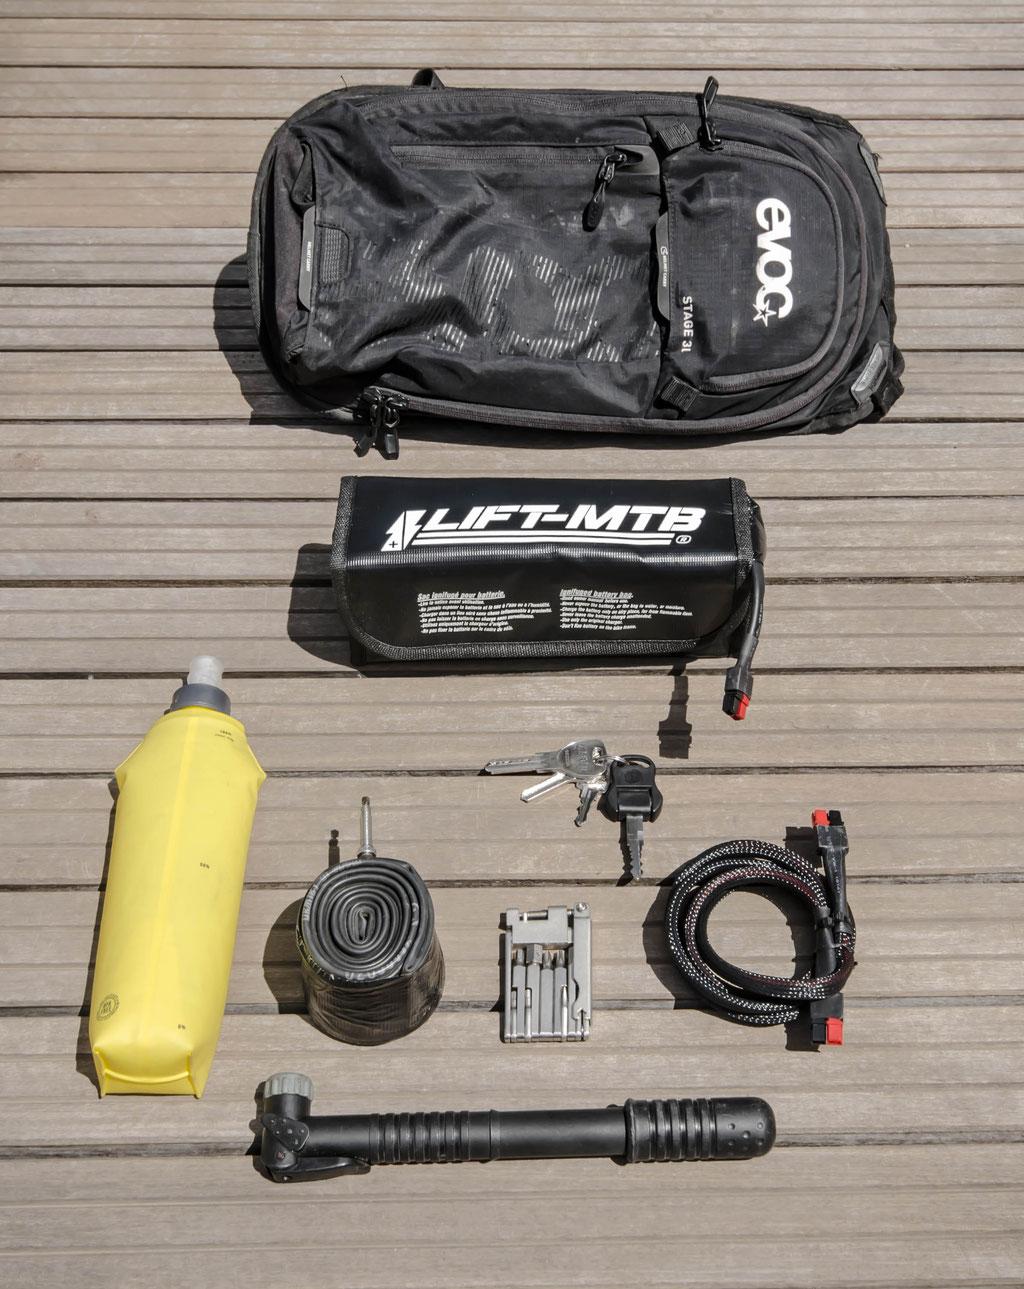 3 liter small battery bag